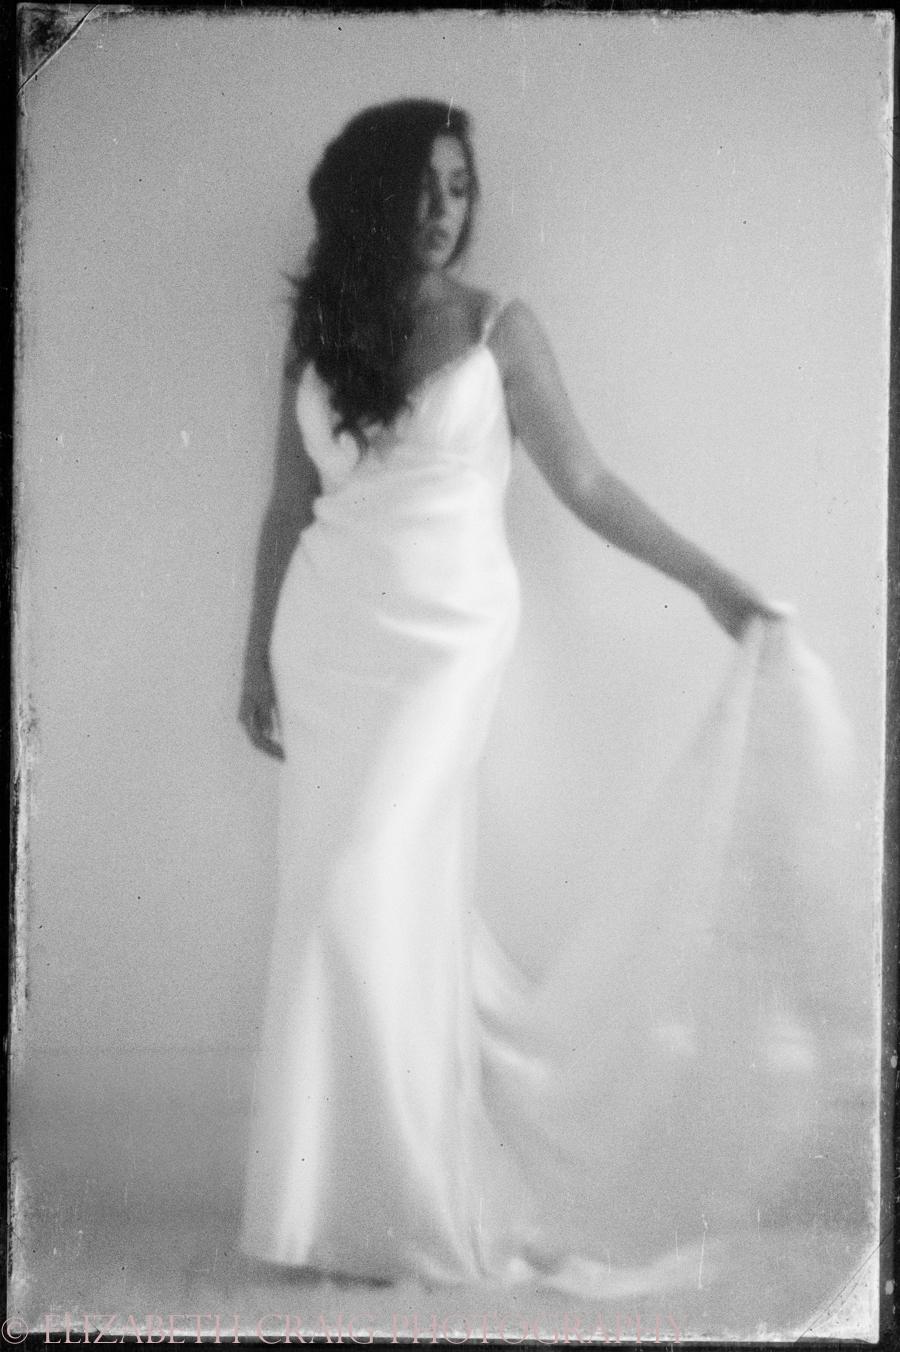 elizabeth-craig-photography-pinhole-lens-003